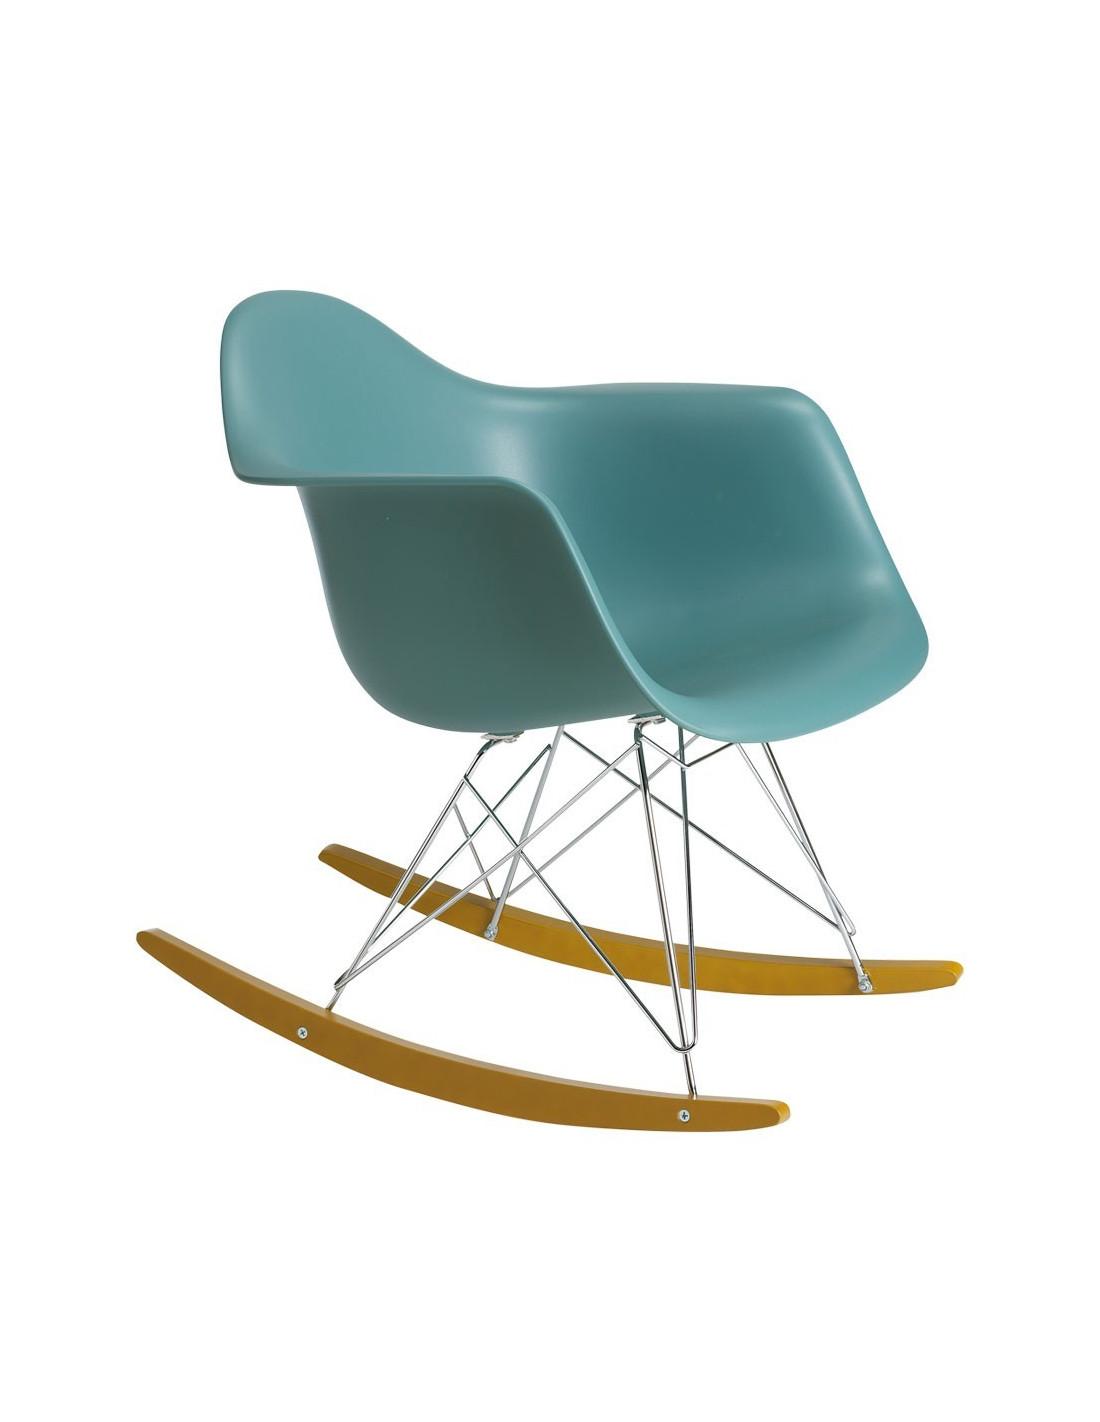 Chaise 224 Bascule Rar Charles Amp Ray Eames Vitra